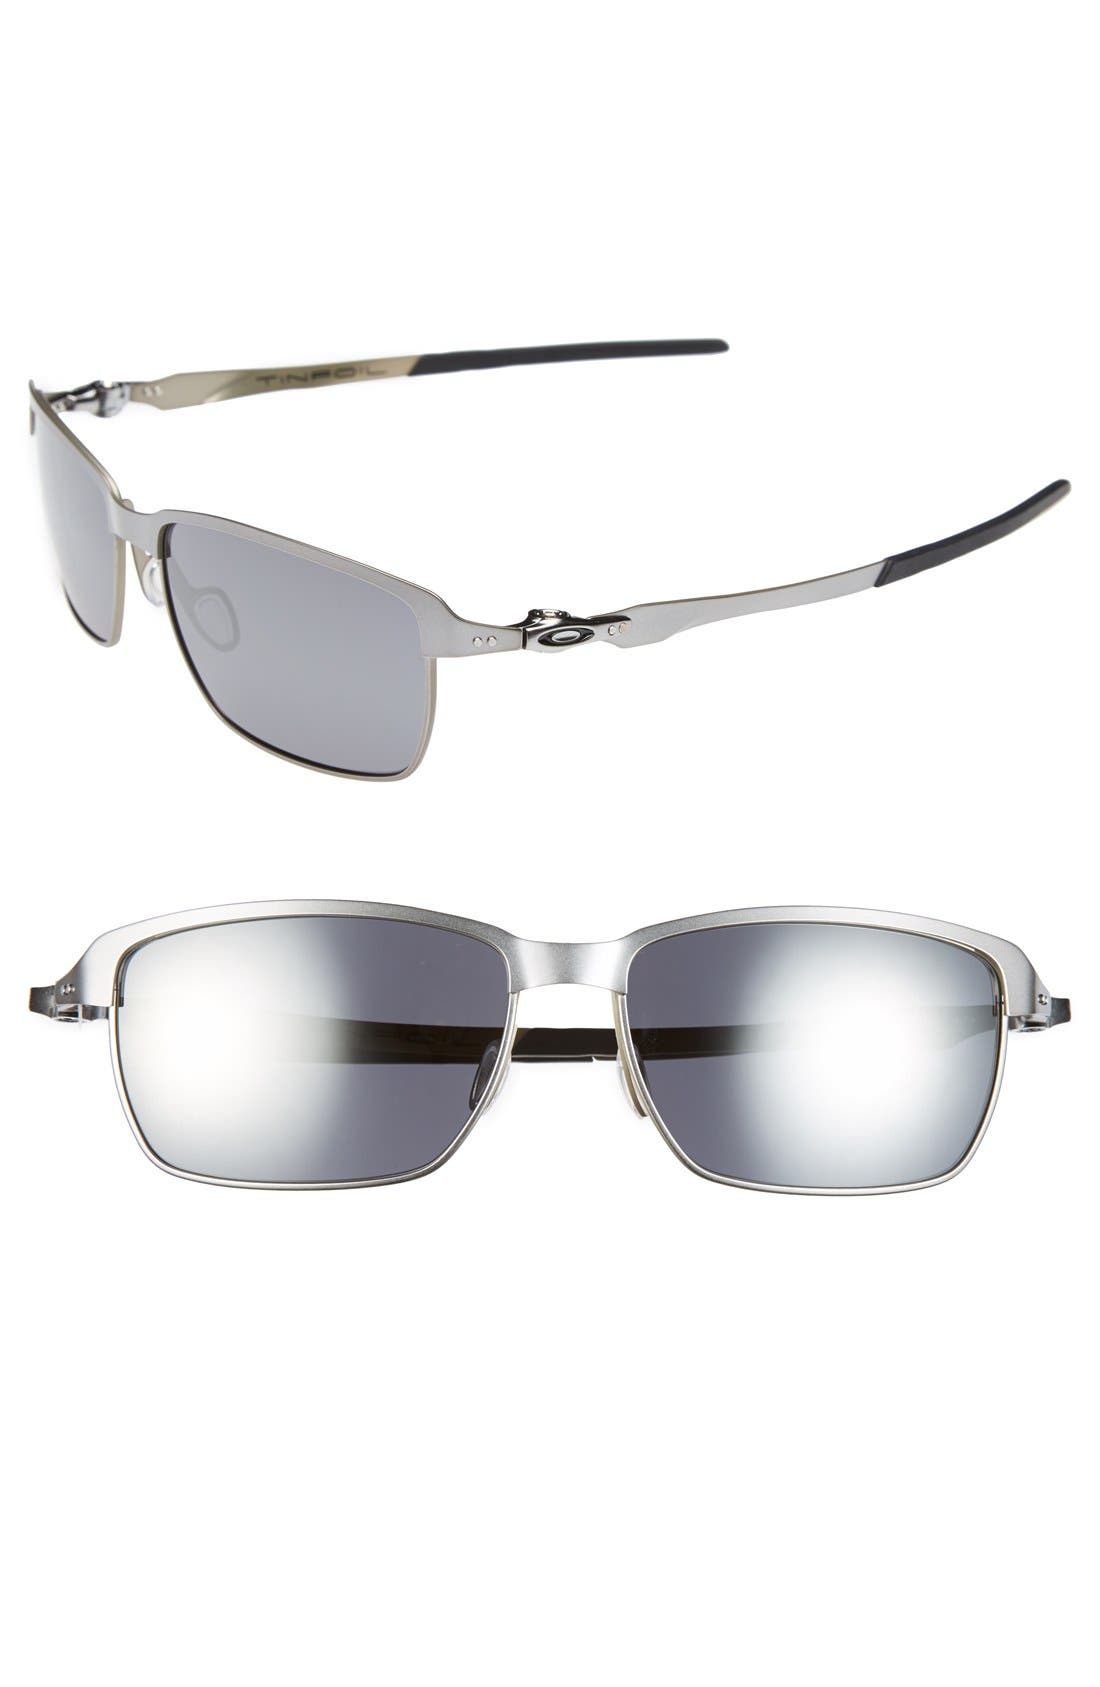 Main Image - Oakley 'Tinfoil' 58mm Sunglasses